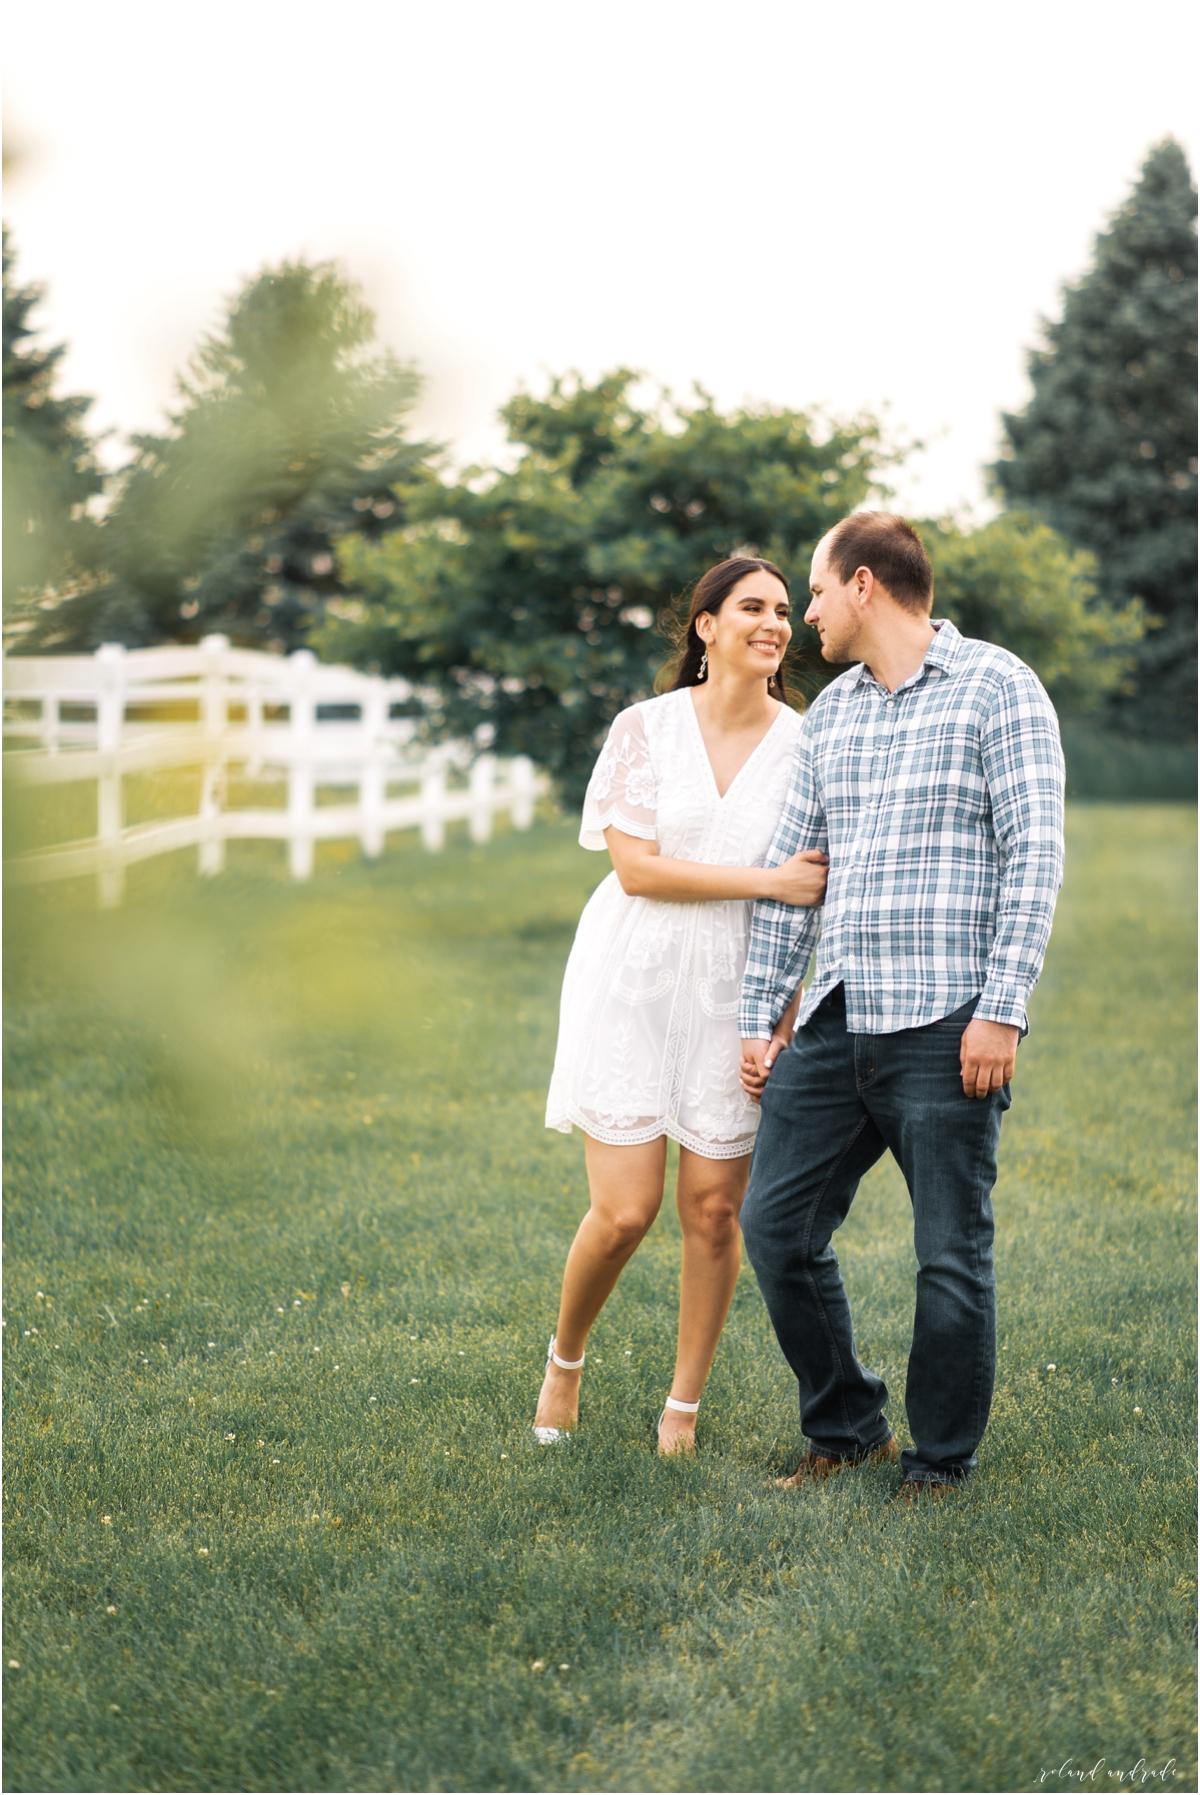 Yesenia + Daniel Northfork Farm Engagement Session Oswego Wedding Photographer Aurora Wedding Photographer8.jpg